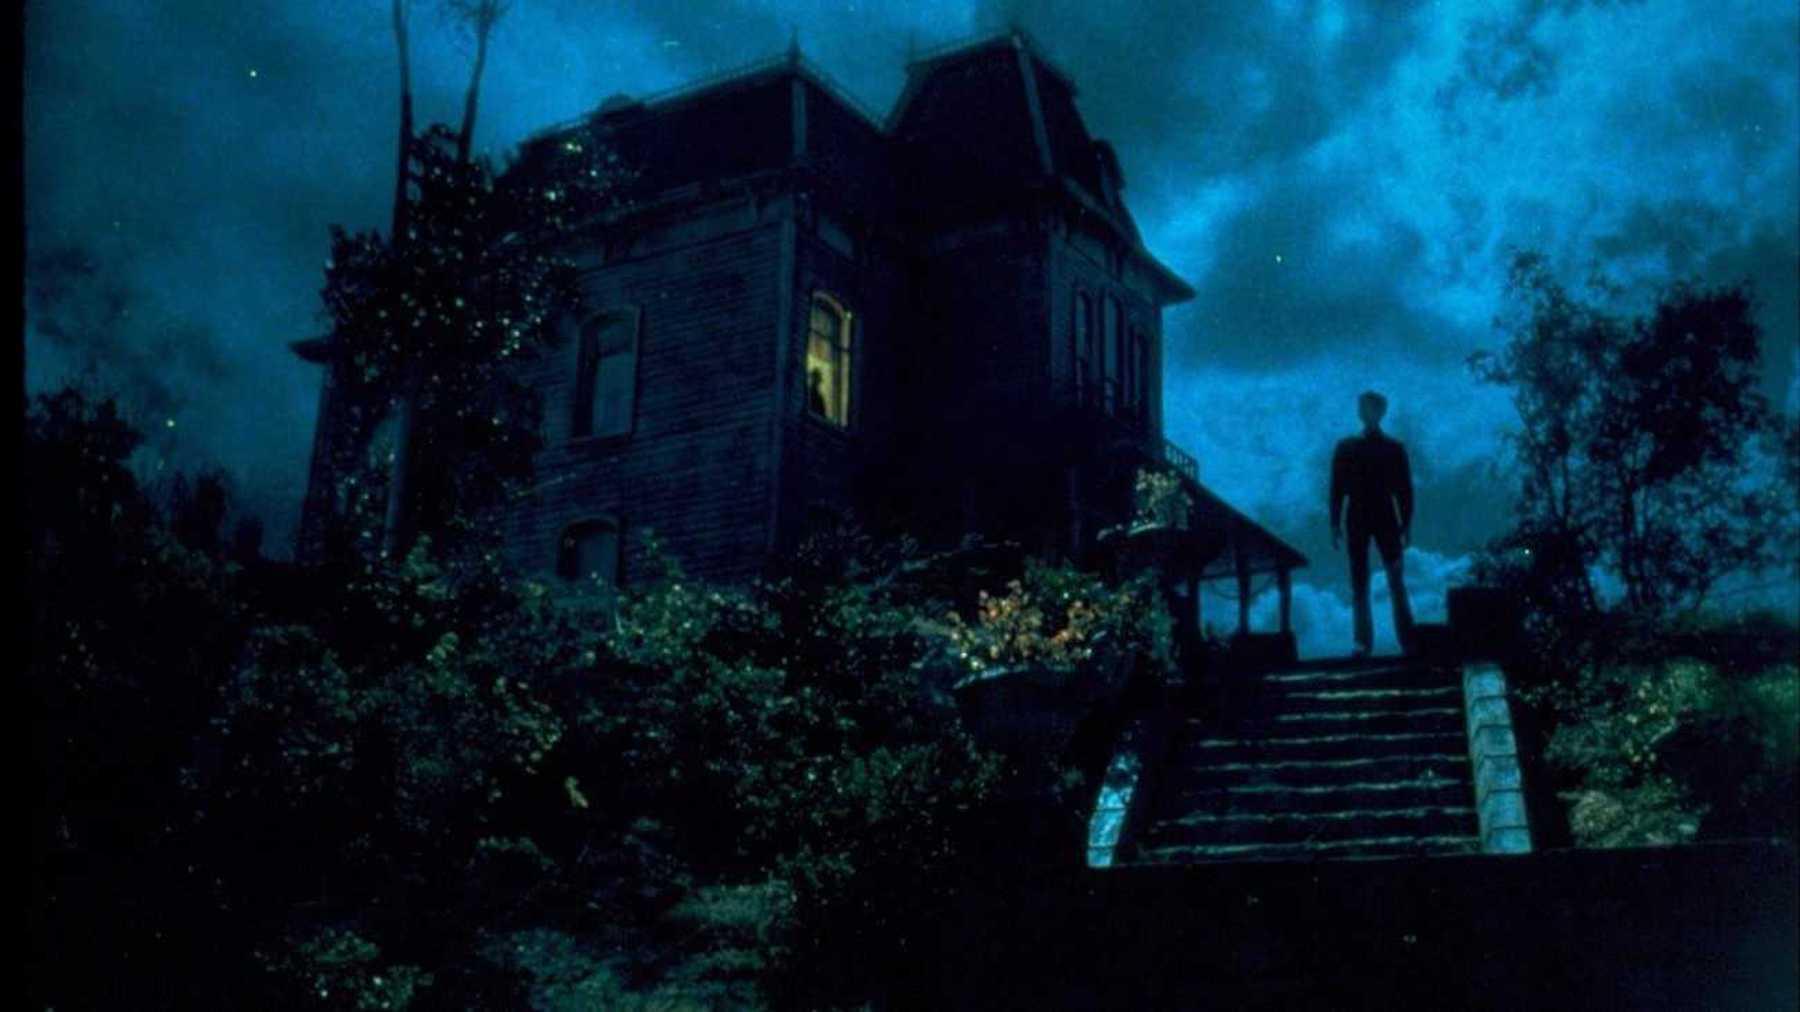 Halloween Horror Sequels